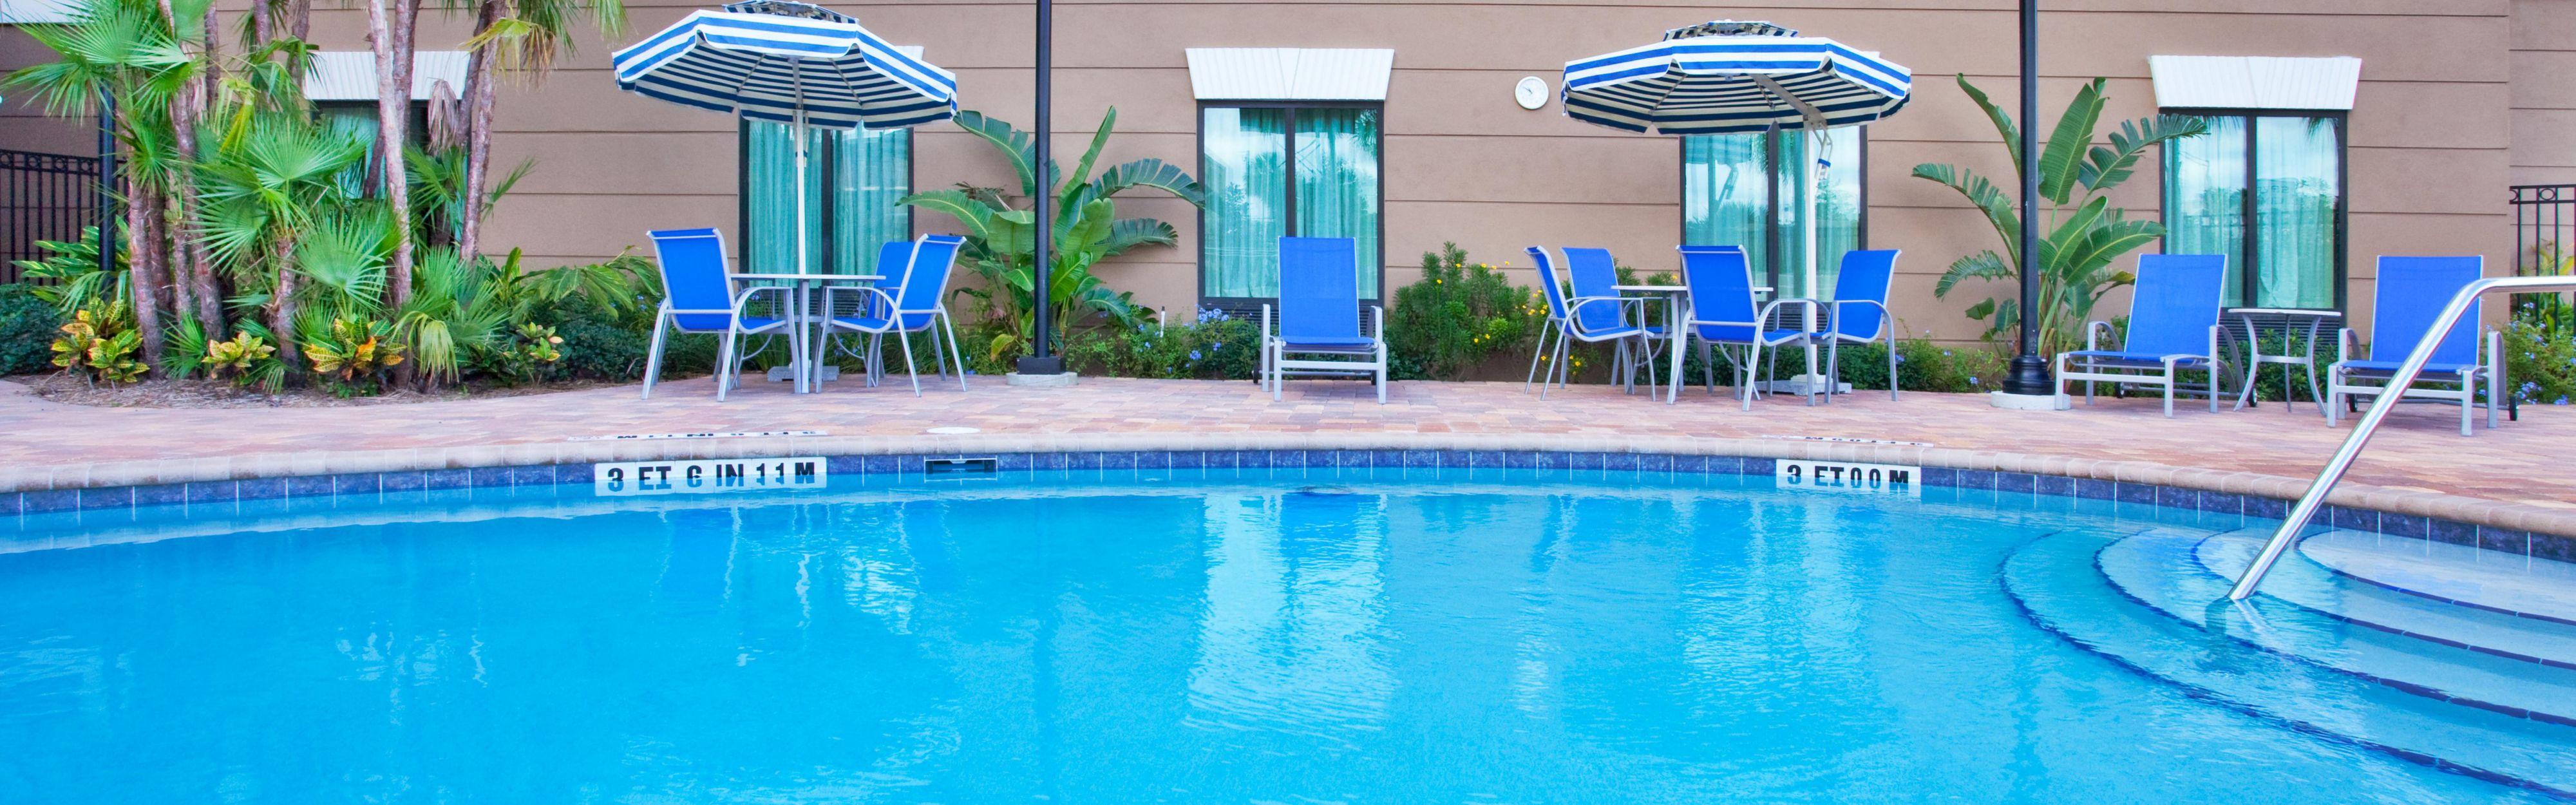 Holiday Inn Express & Suites Orlando - International Drive image 2